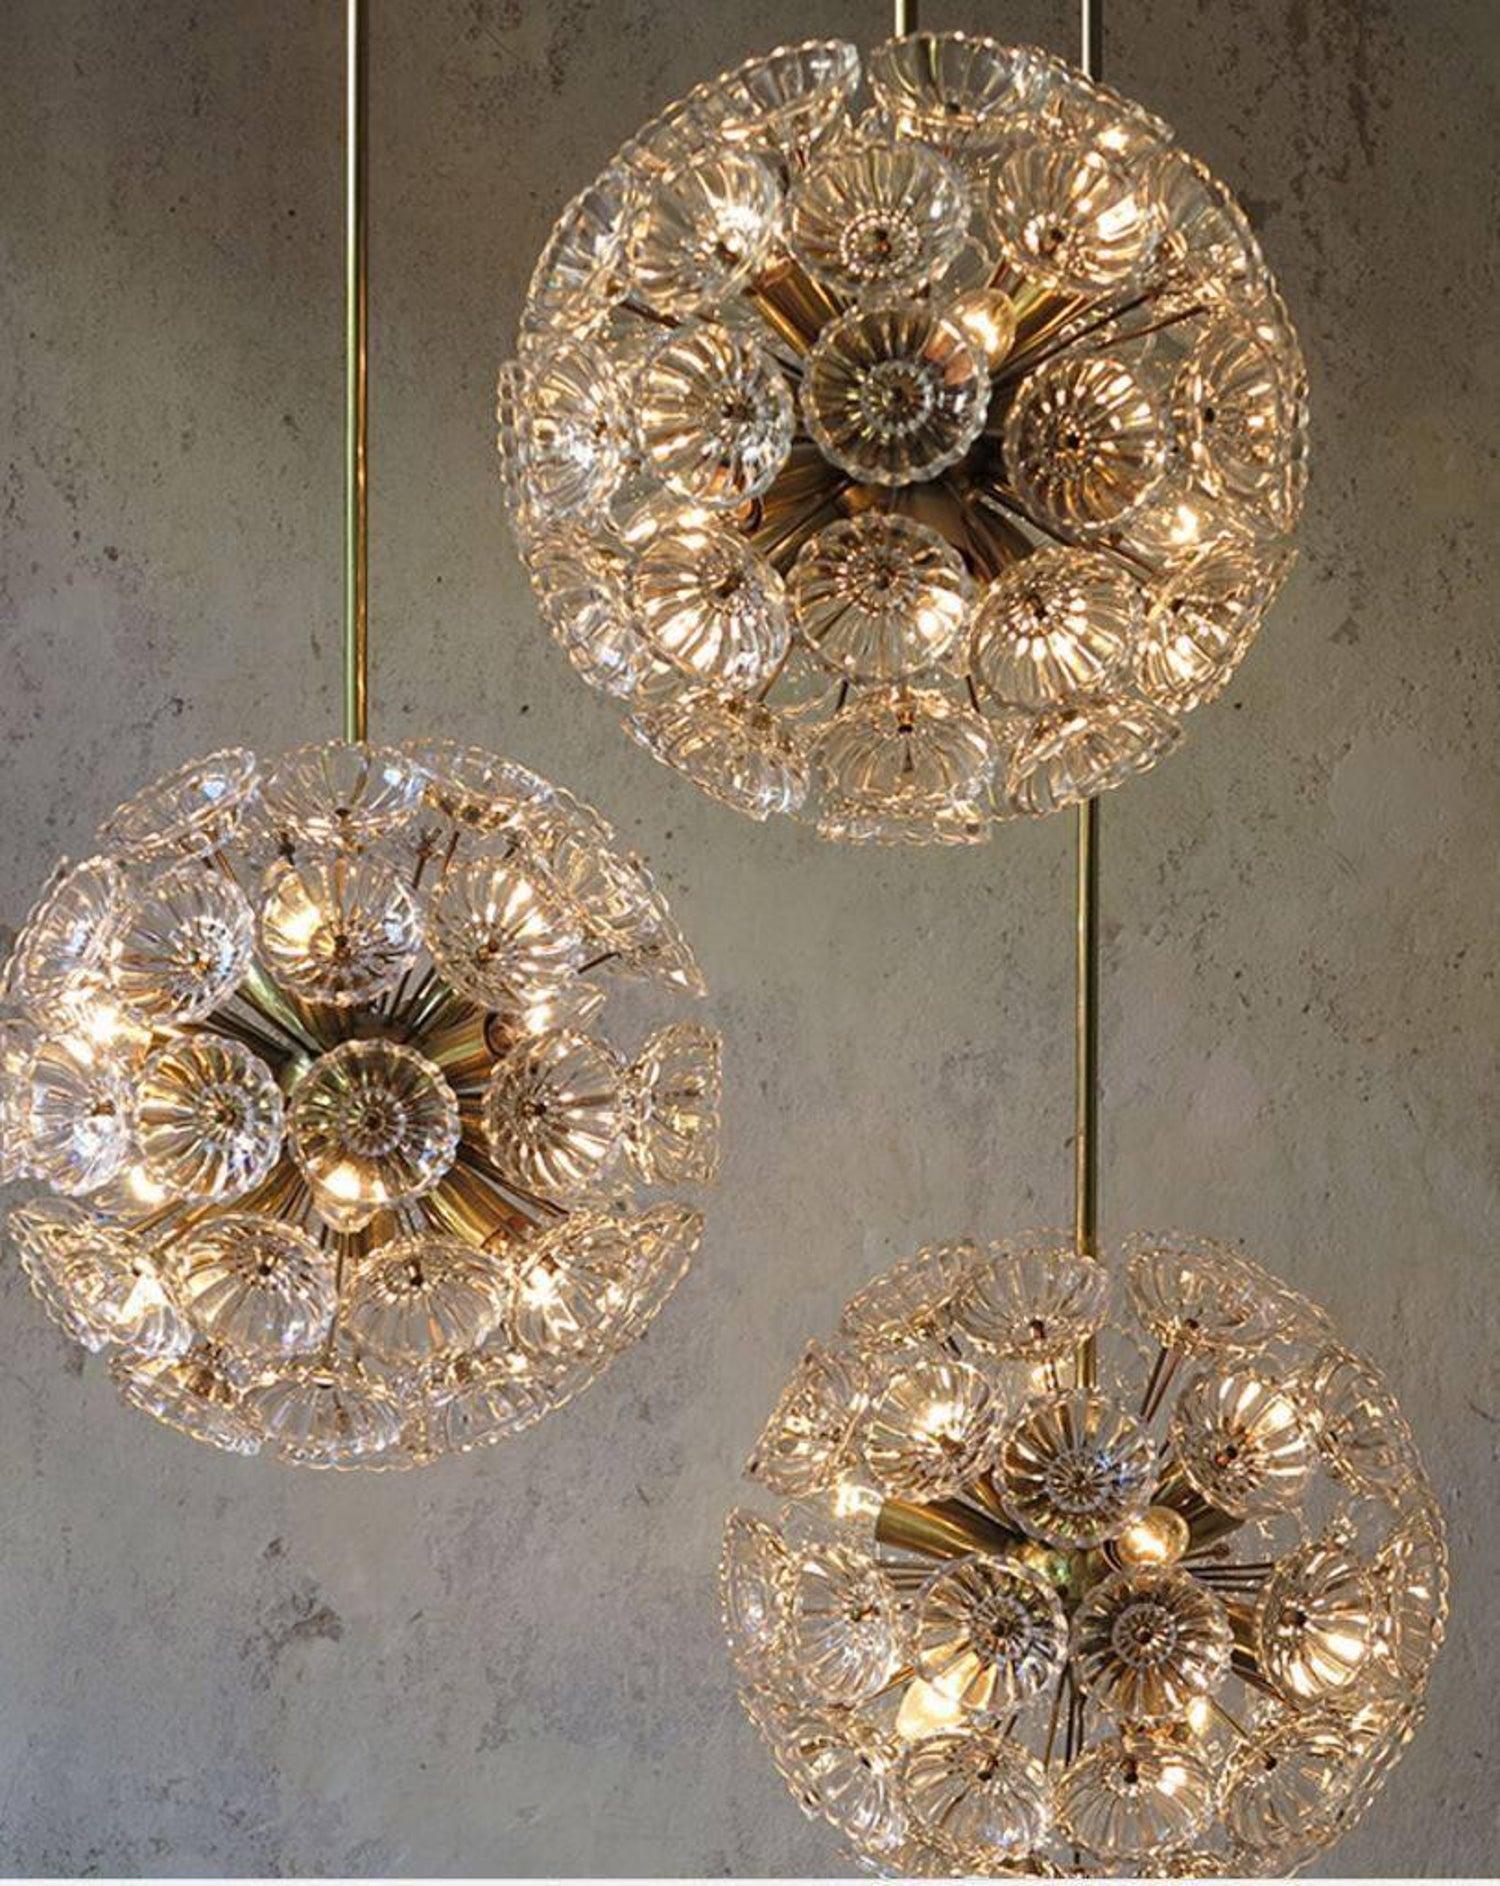 Set of Five Doria Brass Light Fixtures, 4 Wall Lights and 1 Chandelier, 1960